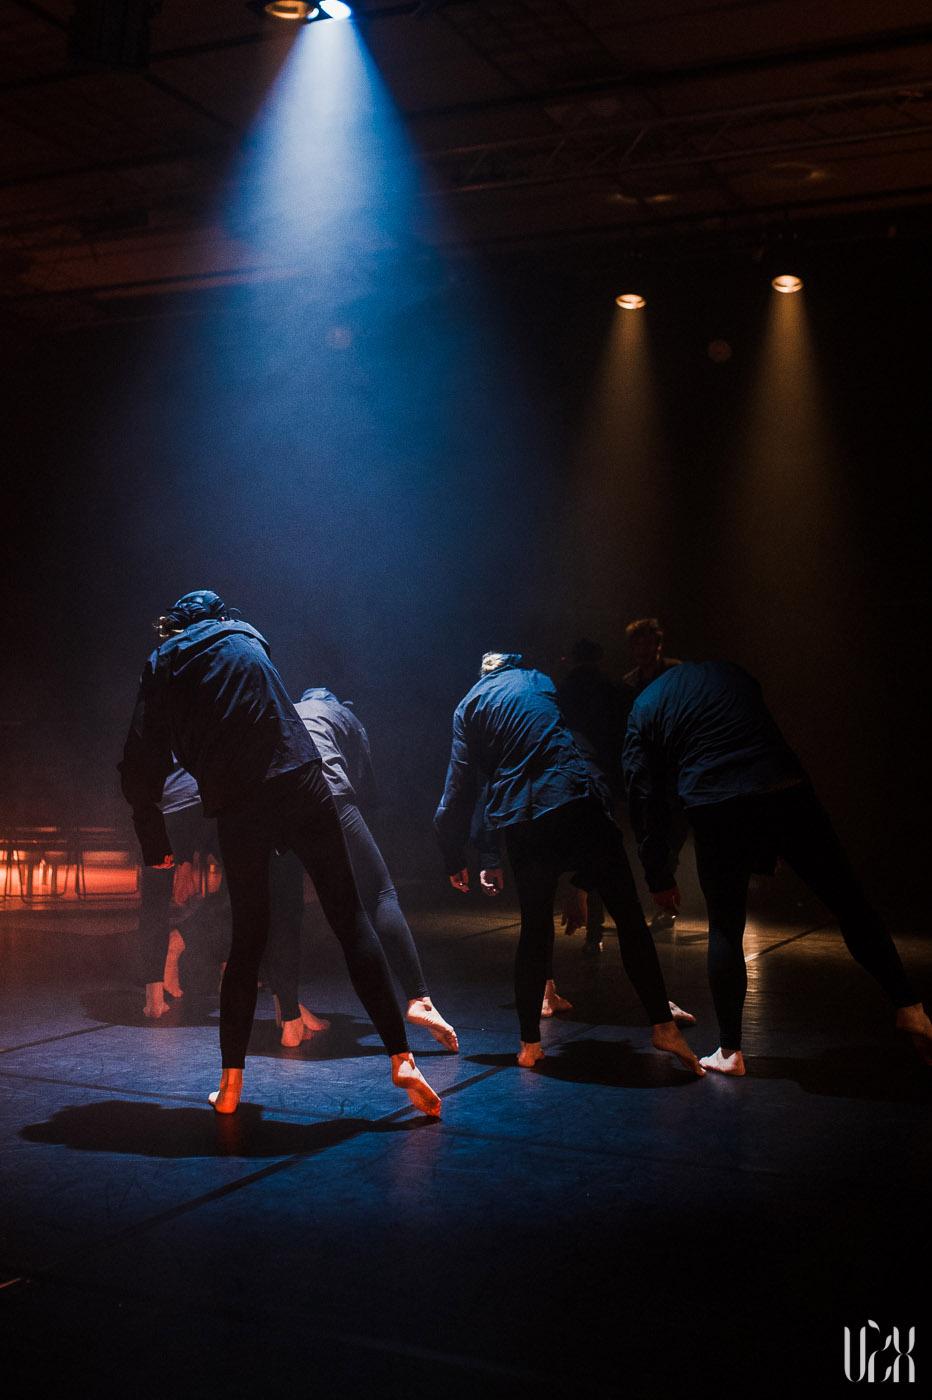 E.sabaliauskaite Vzx.lt Faustas Teatras Event 003